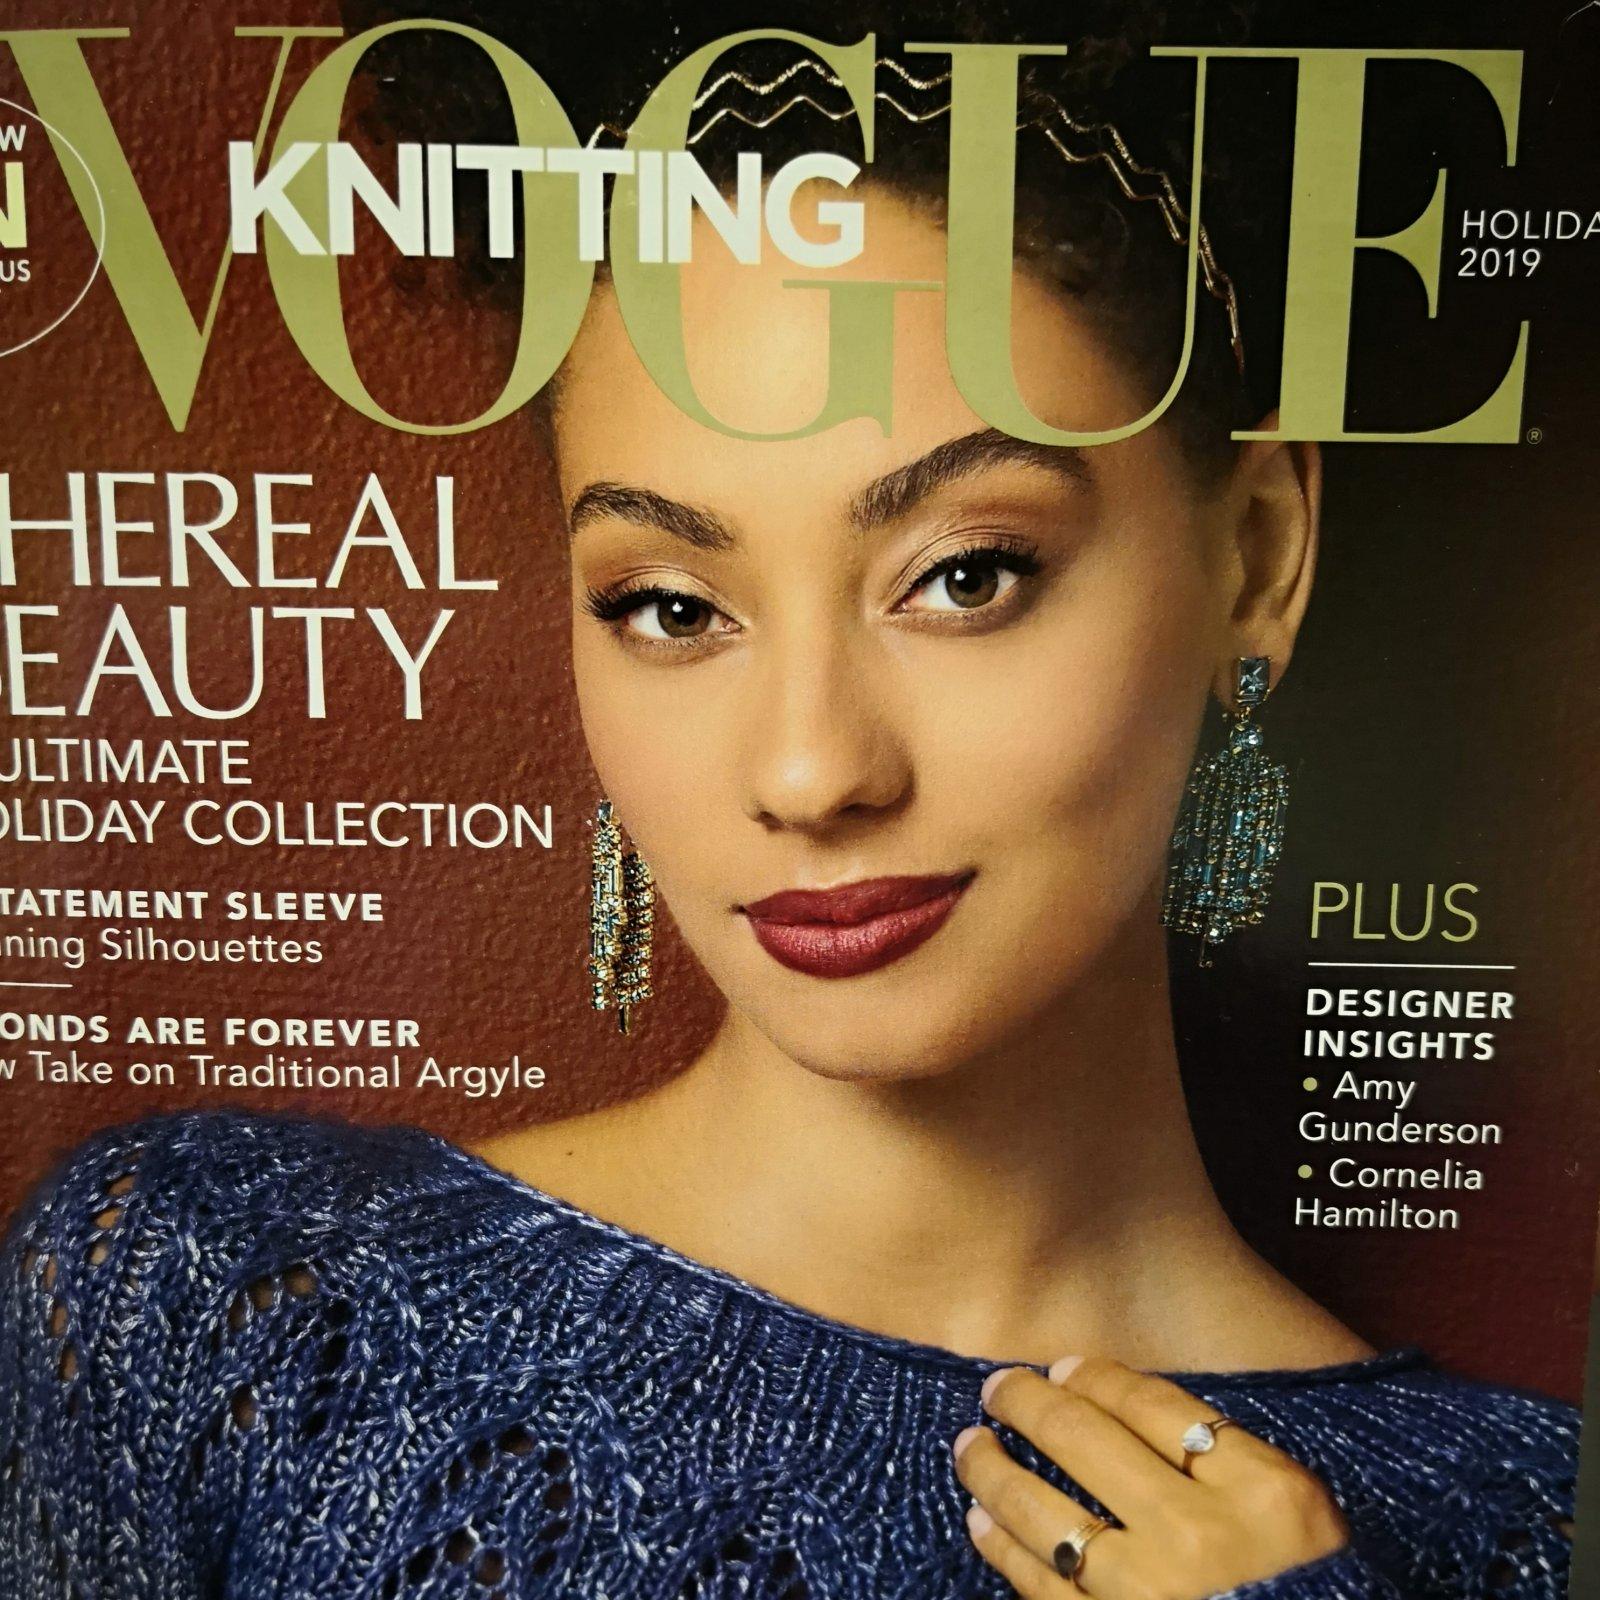 Vogue Knitting Holiday 2019